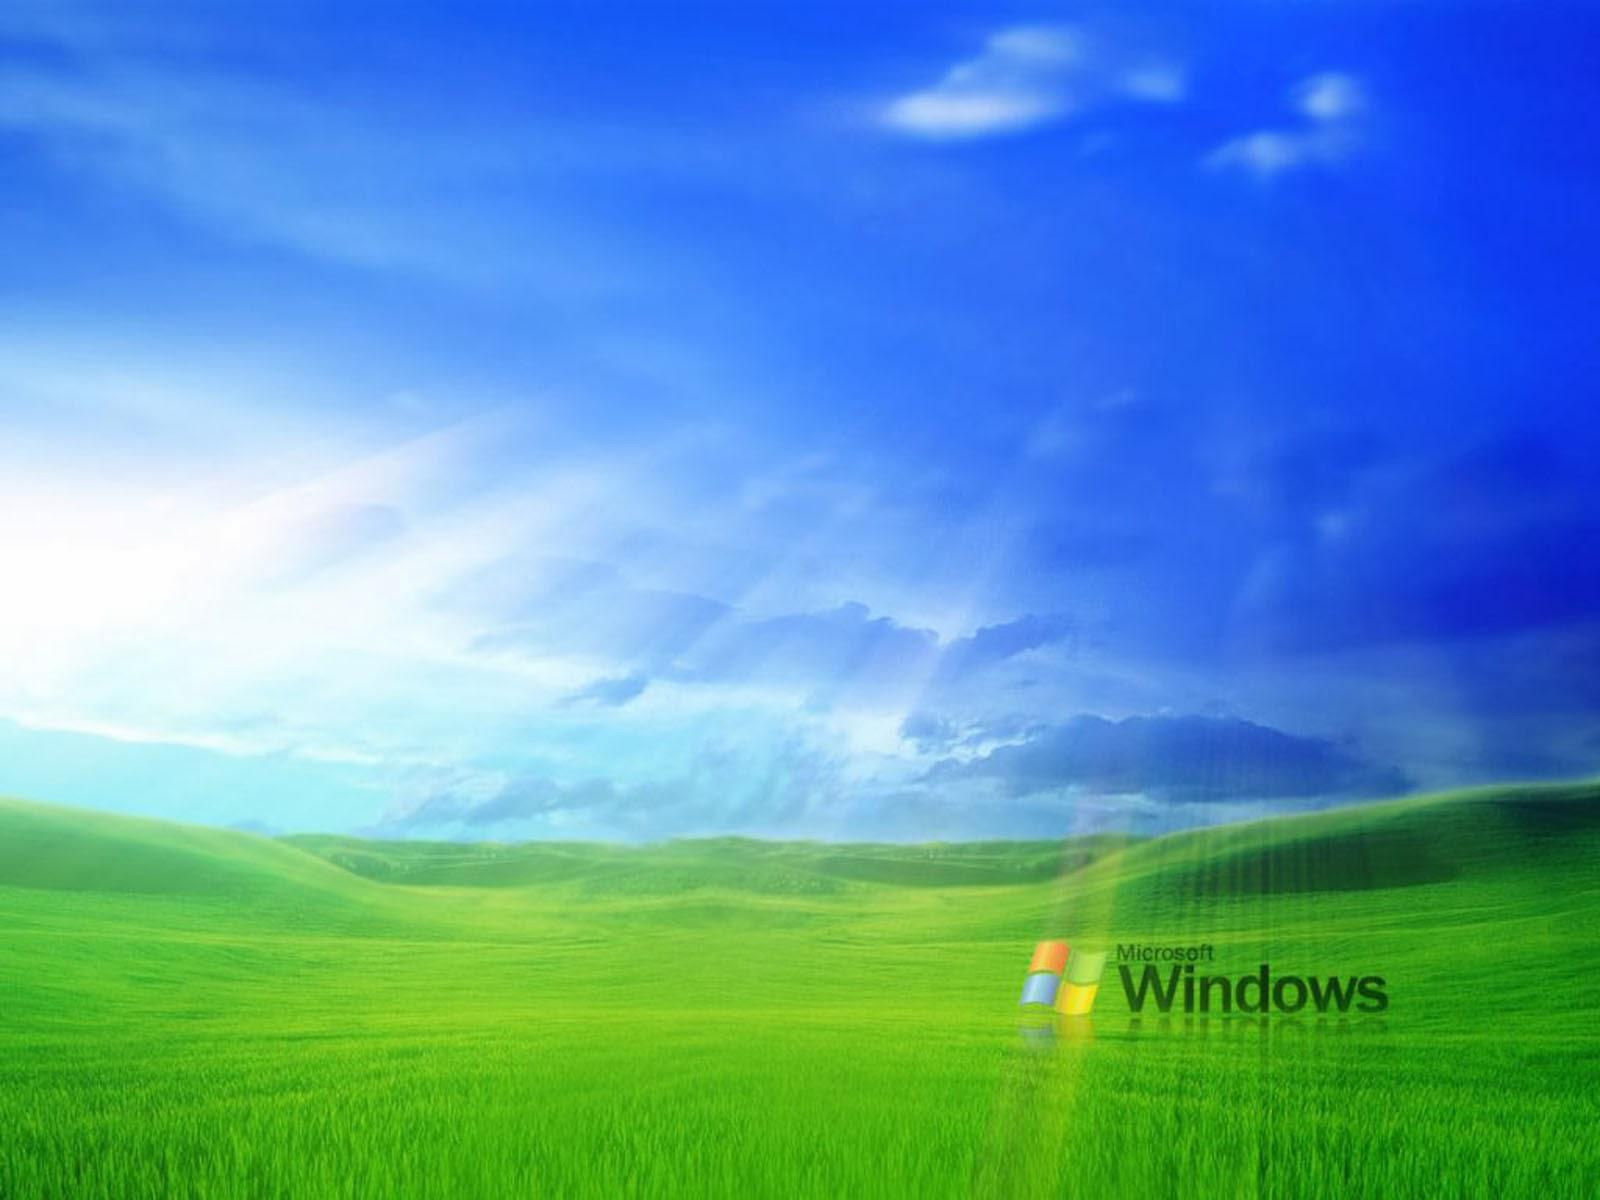 wallpapers Grass Windows XP Wallpapers 1600x1200